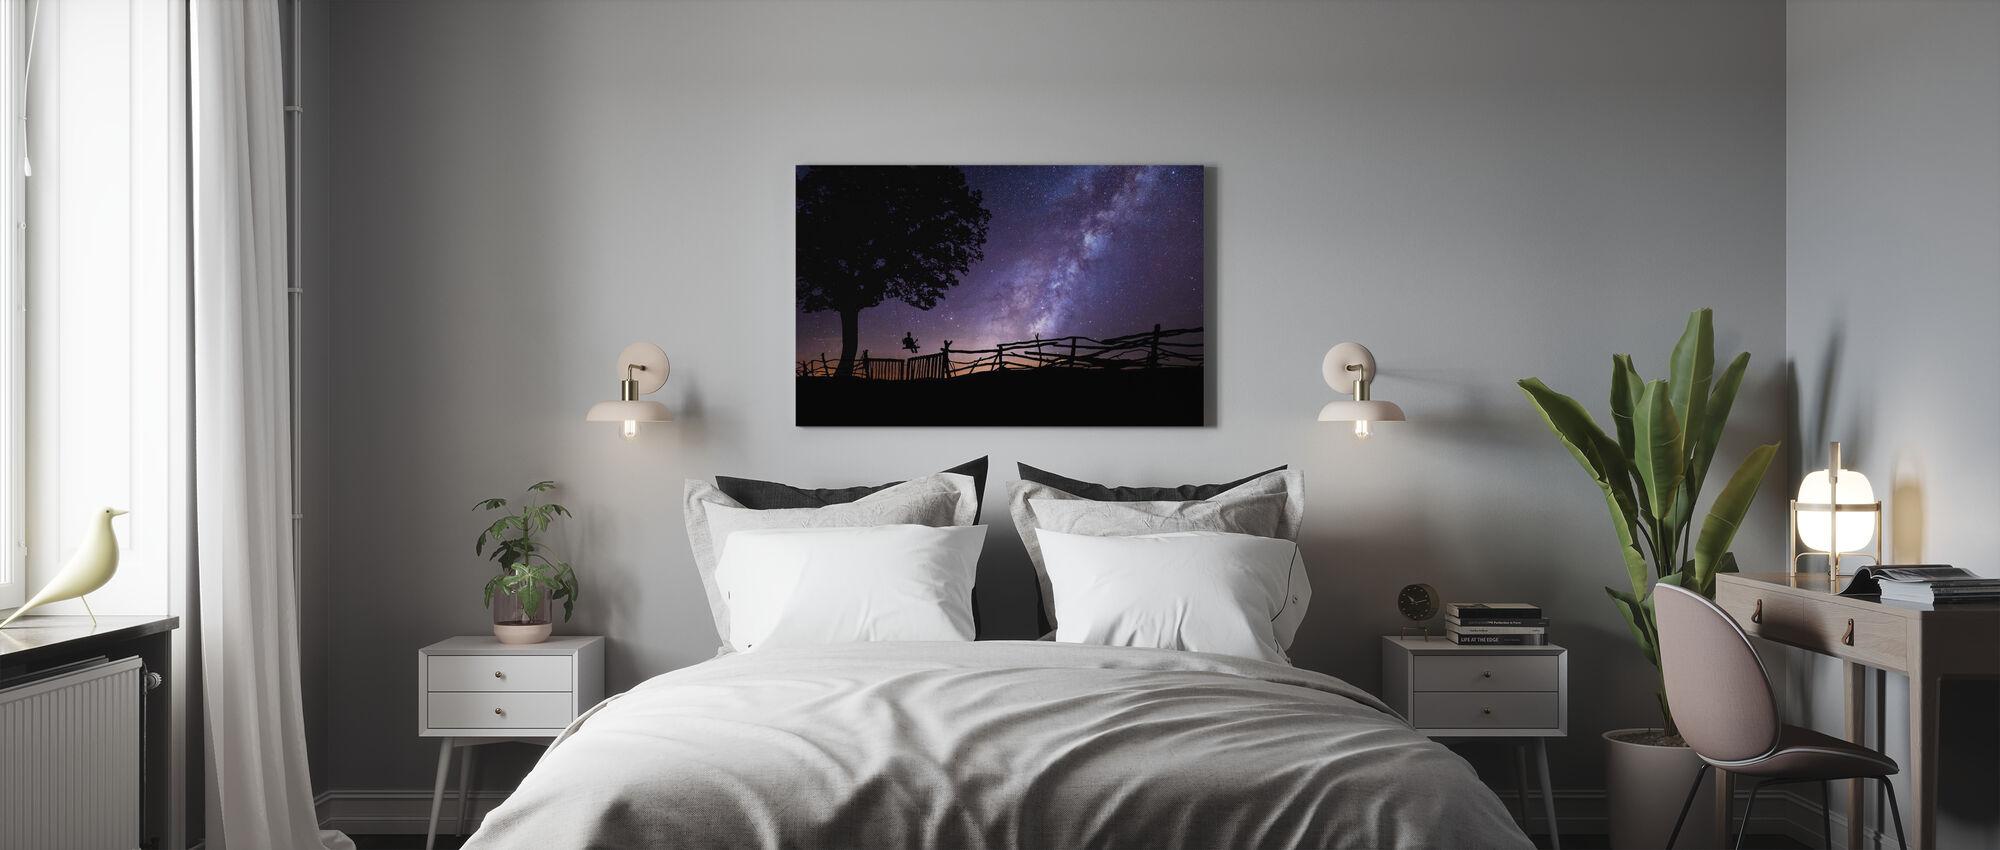 Starry Night Sky - Canvas print - Bedroom